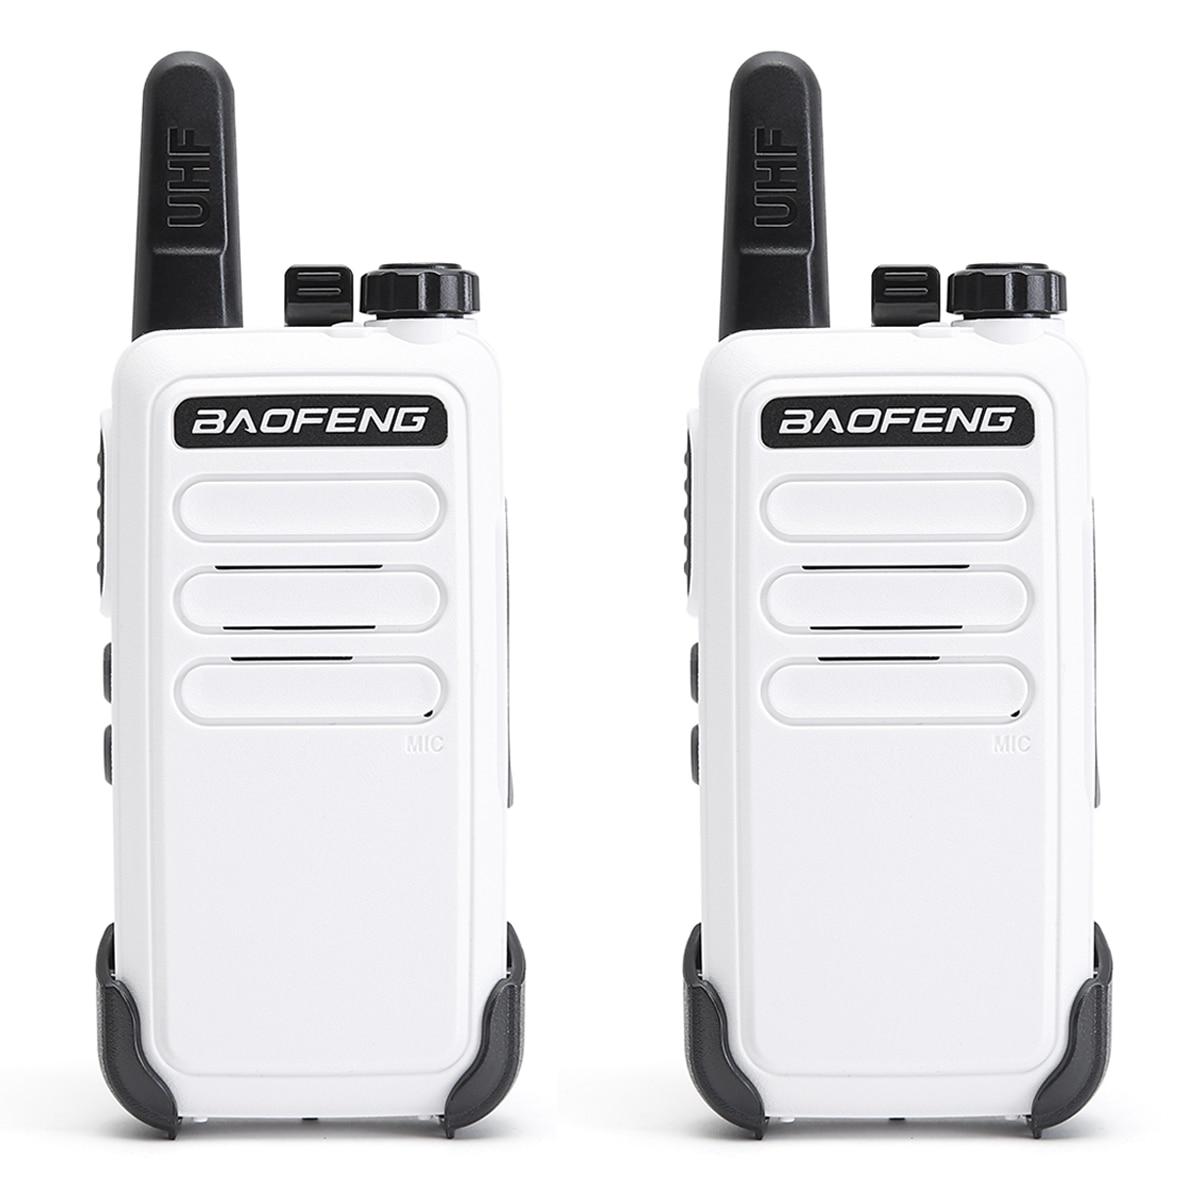 De Baofeng BF-C9 Mini Walkie Talkie de UHF 400-470MHz portátil de mano Radio de dos vías de Radio Comunicador transceptor Woki Toki